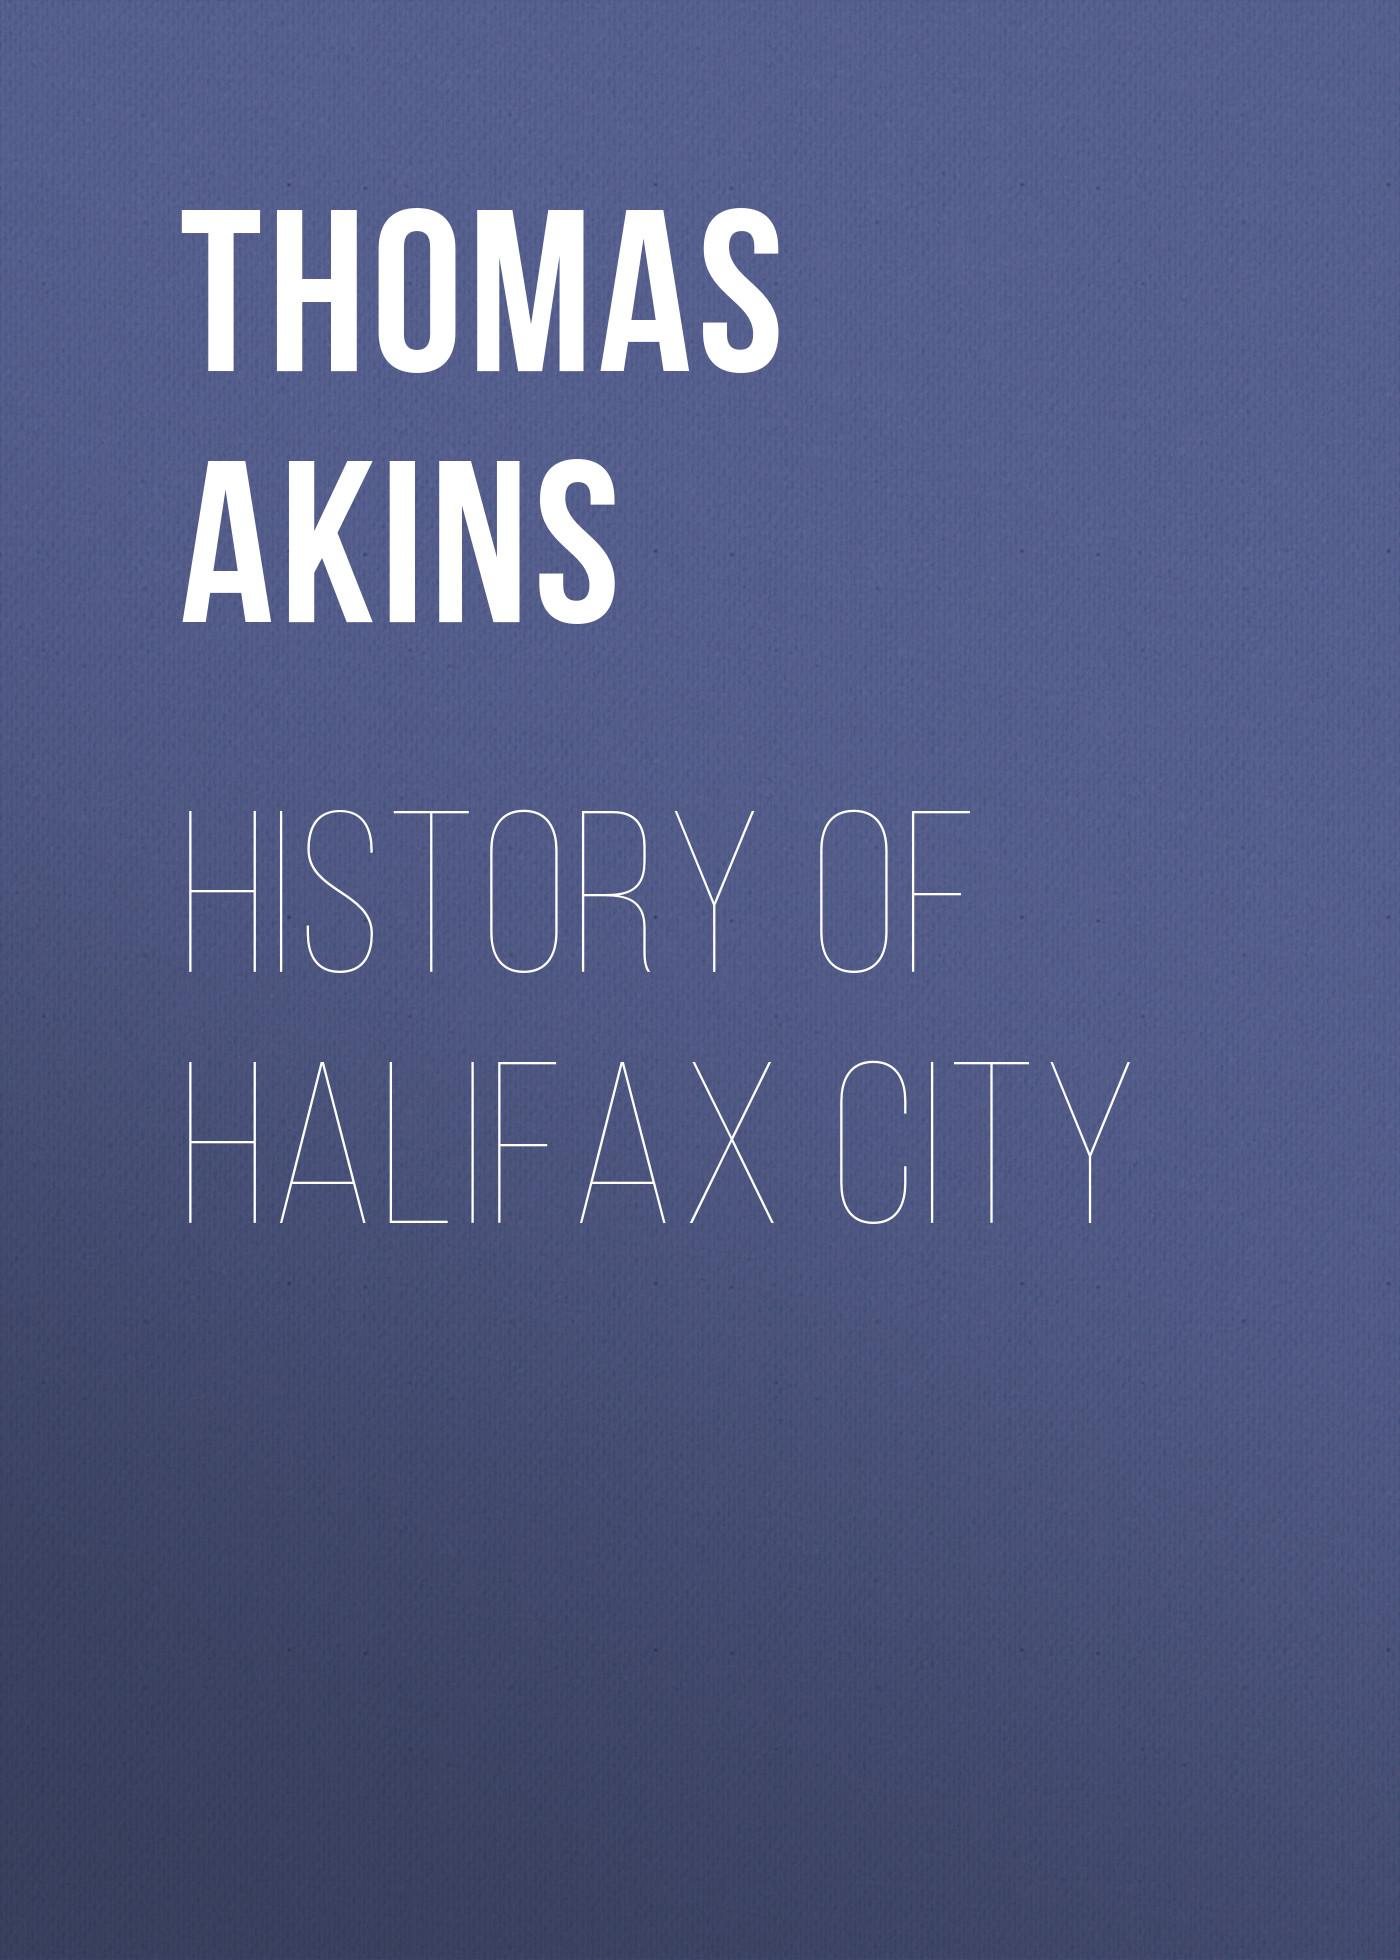 Akins Thomas B. History of Halifax City thomas osborne j pacific eldorado a history of greater california